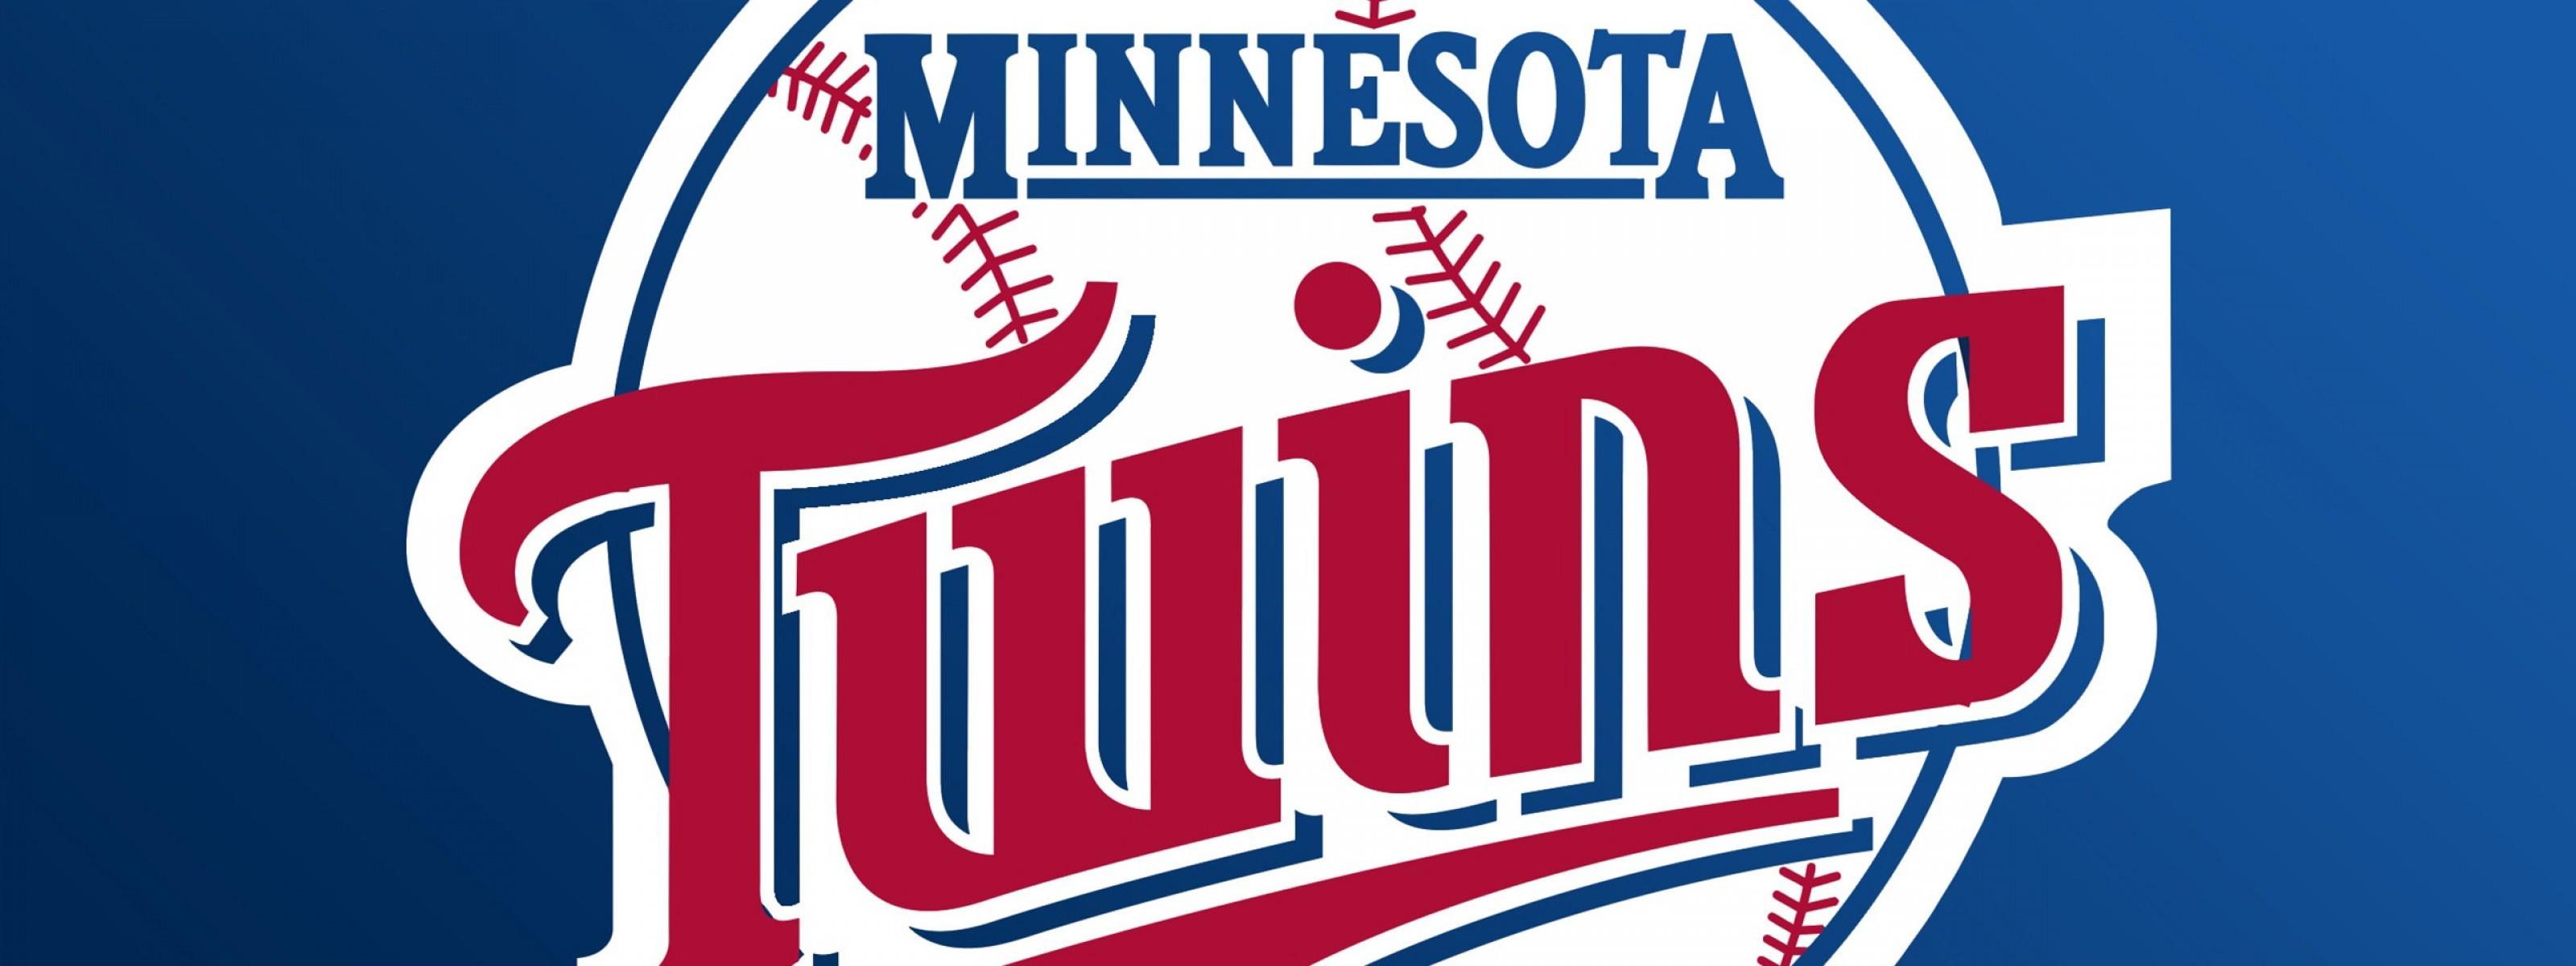 MINNESOTA TWINS mlb baseball (13) wallpaper | | 232152 .